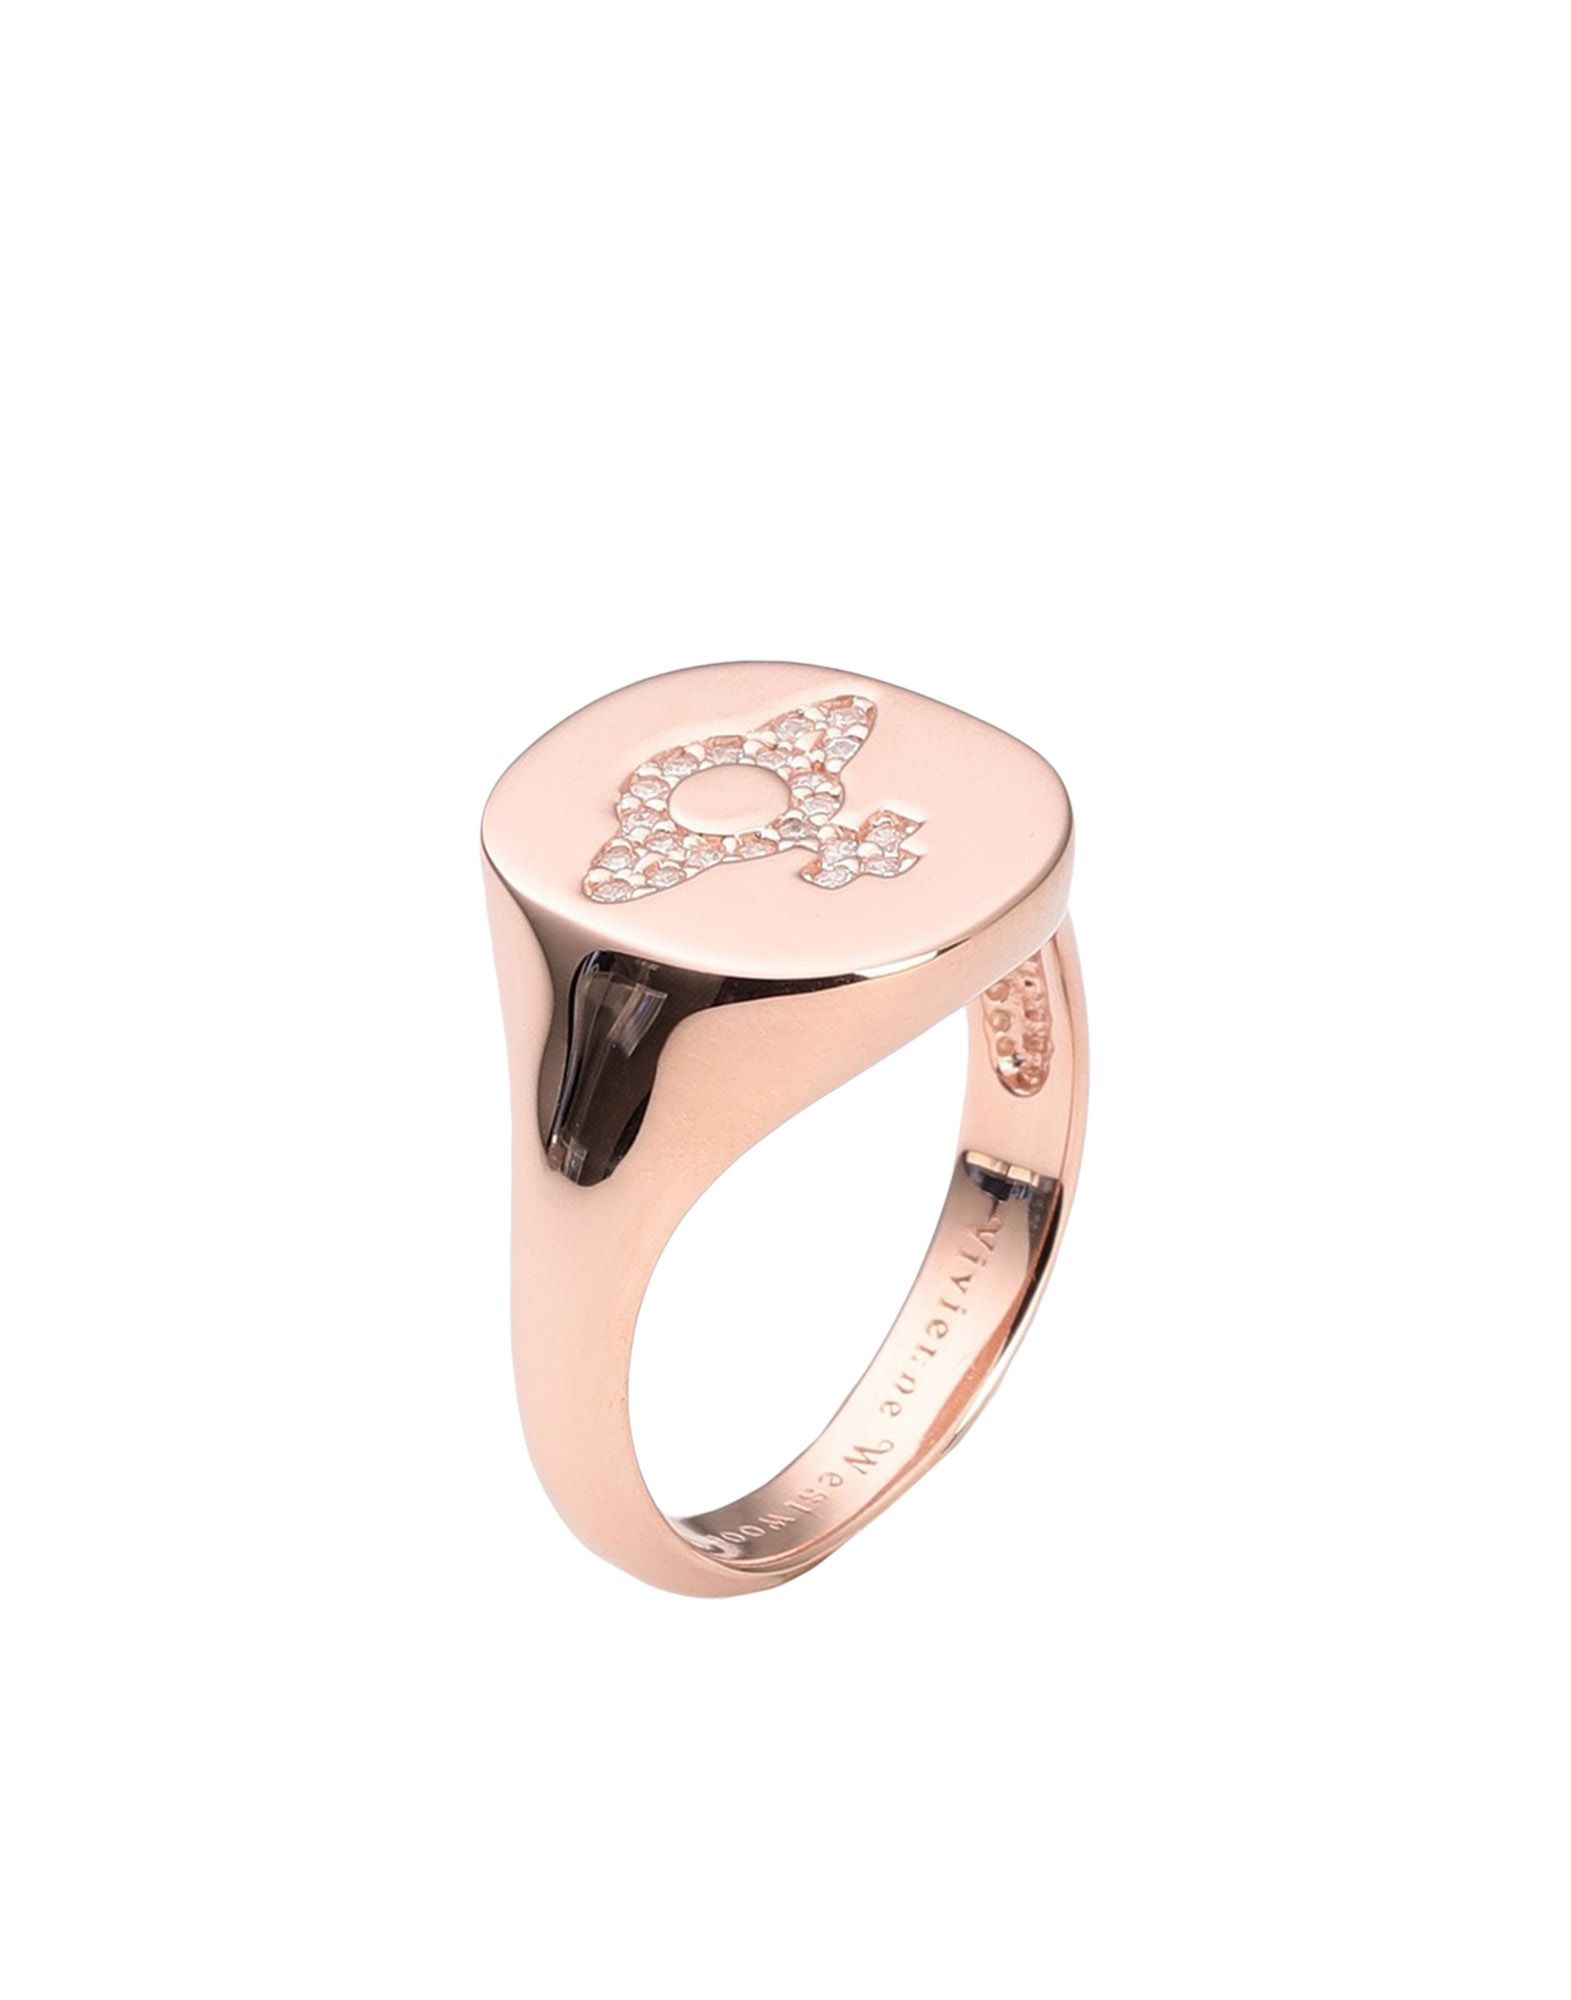 Vivienne Westwood Ring In Copper